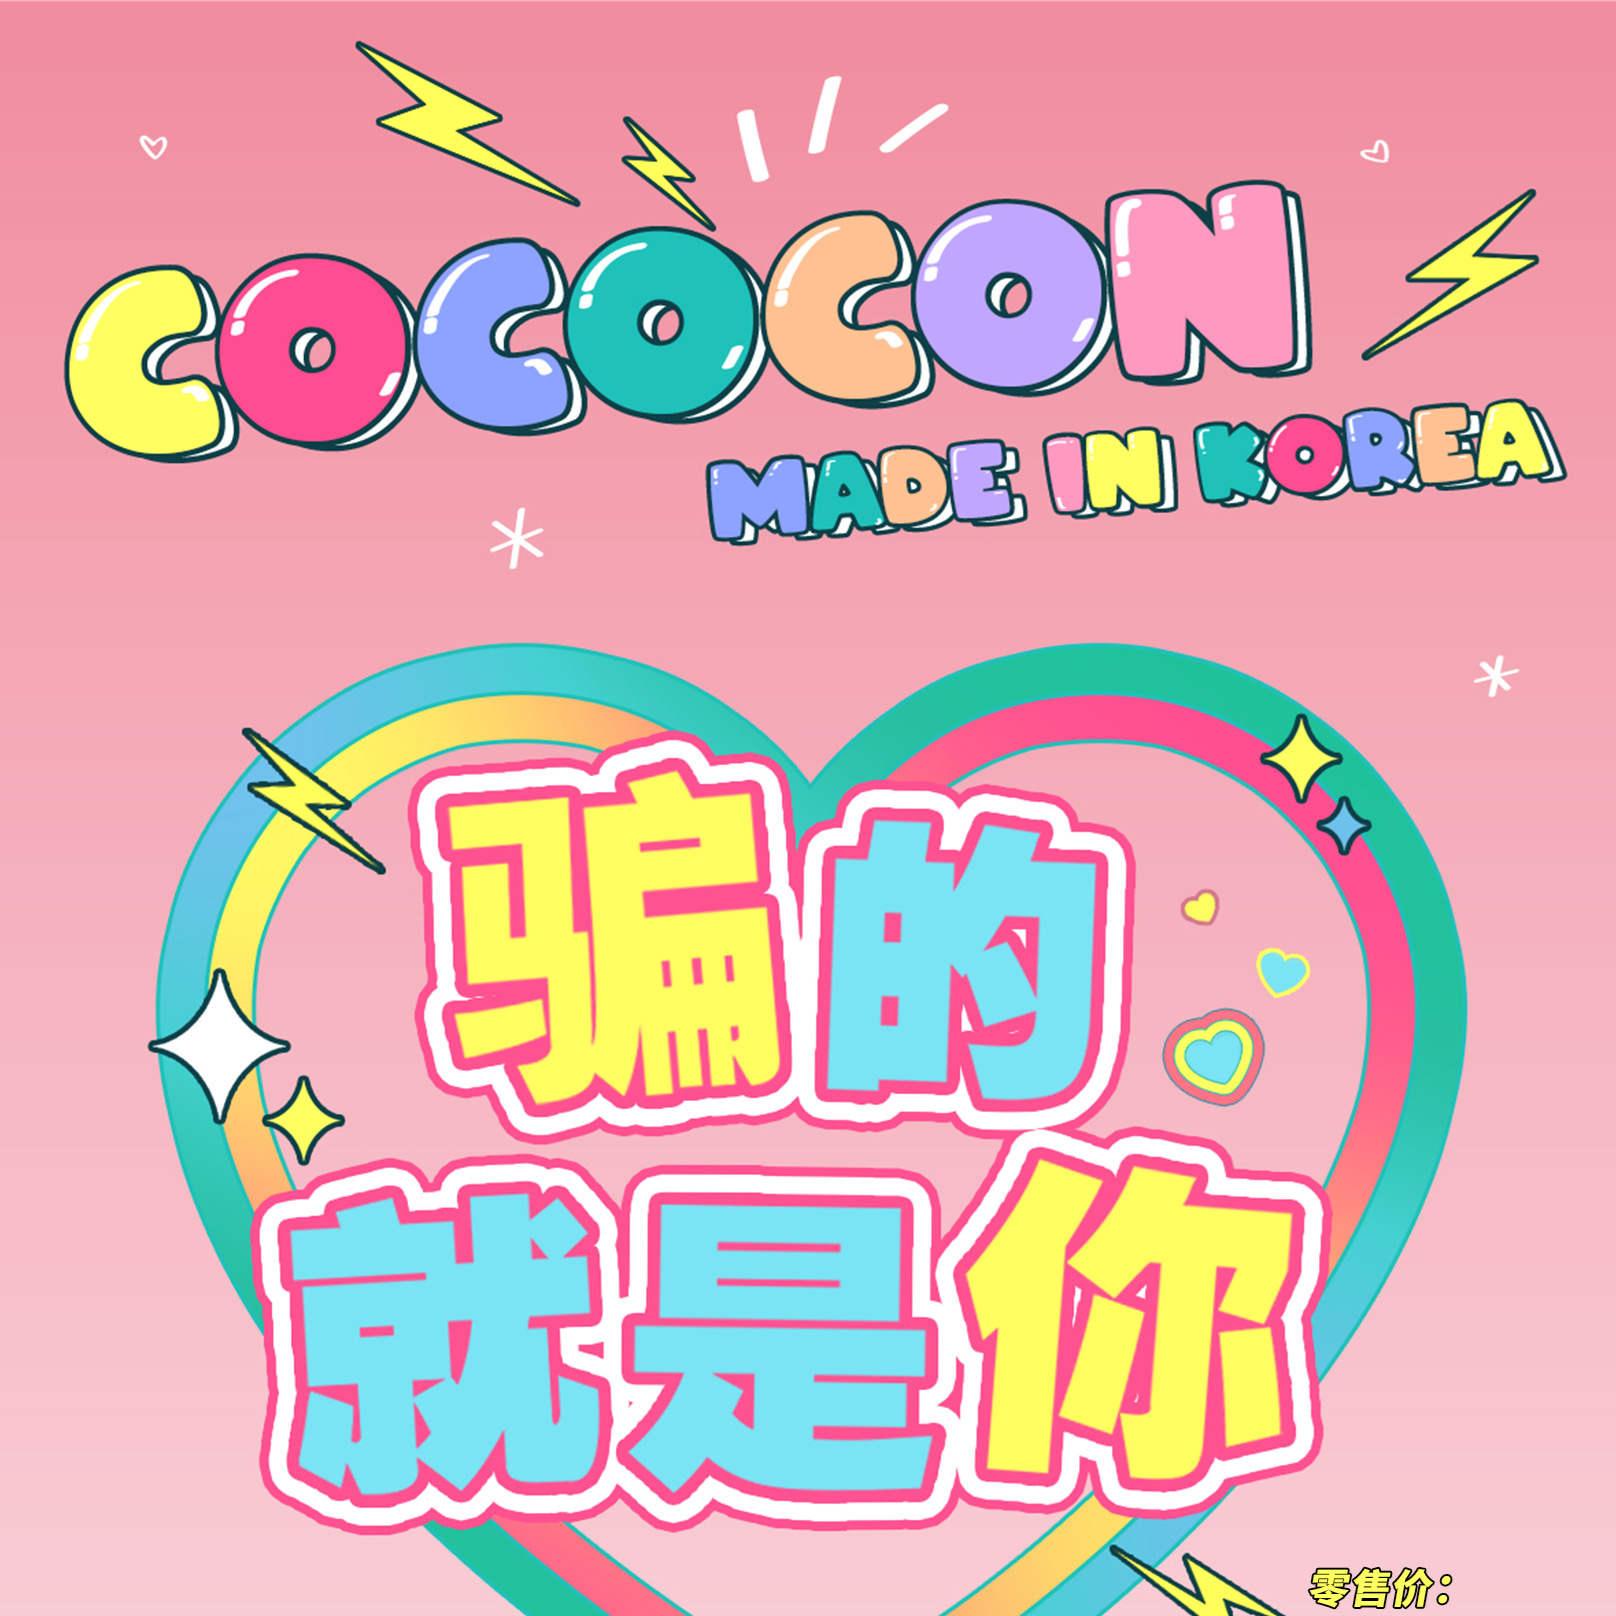 Cococon美瞳 愚人节特辑